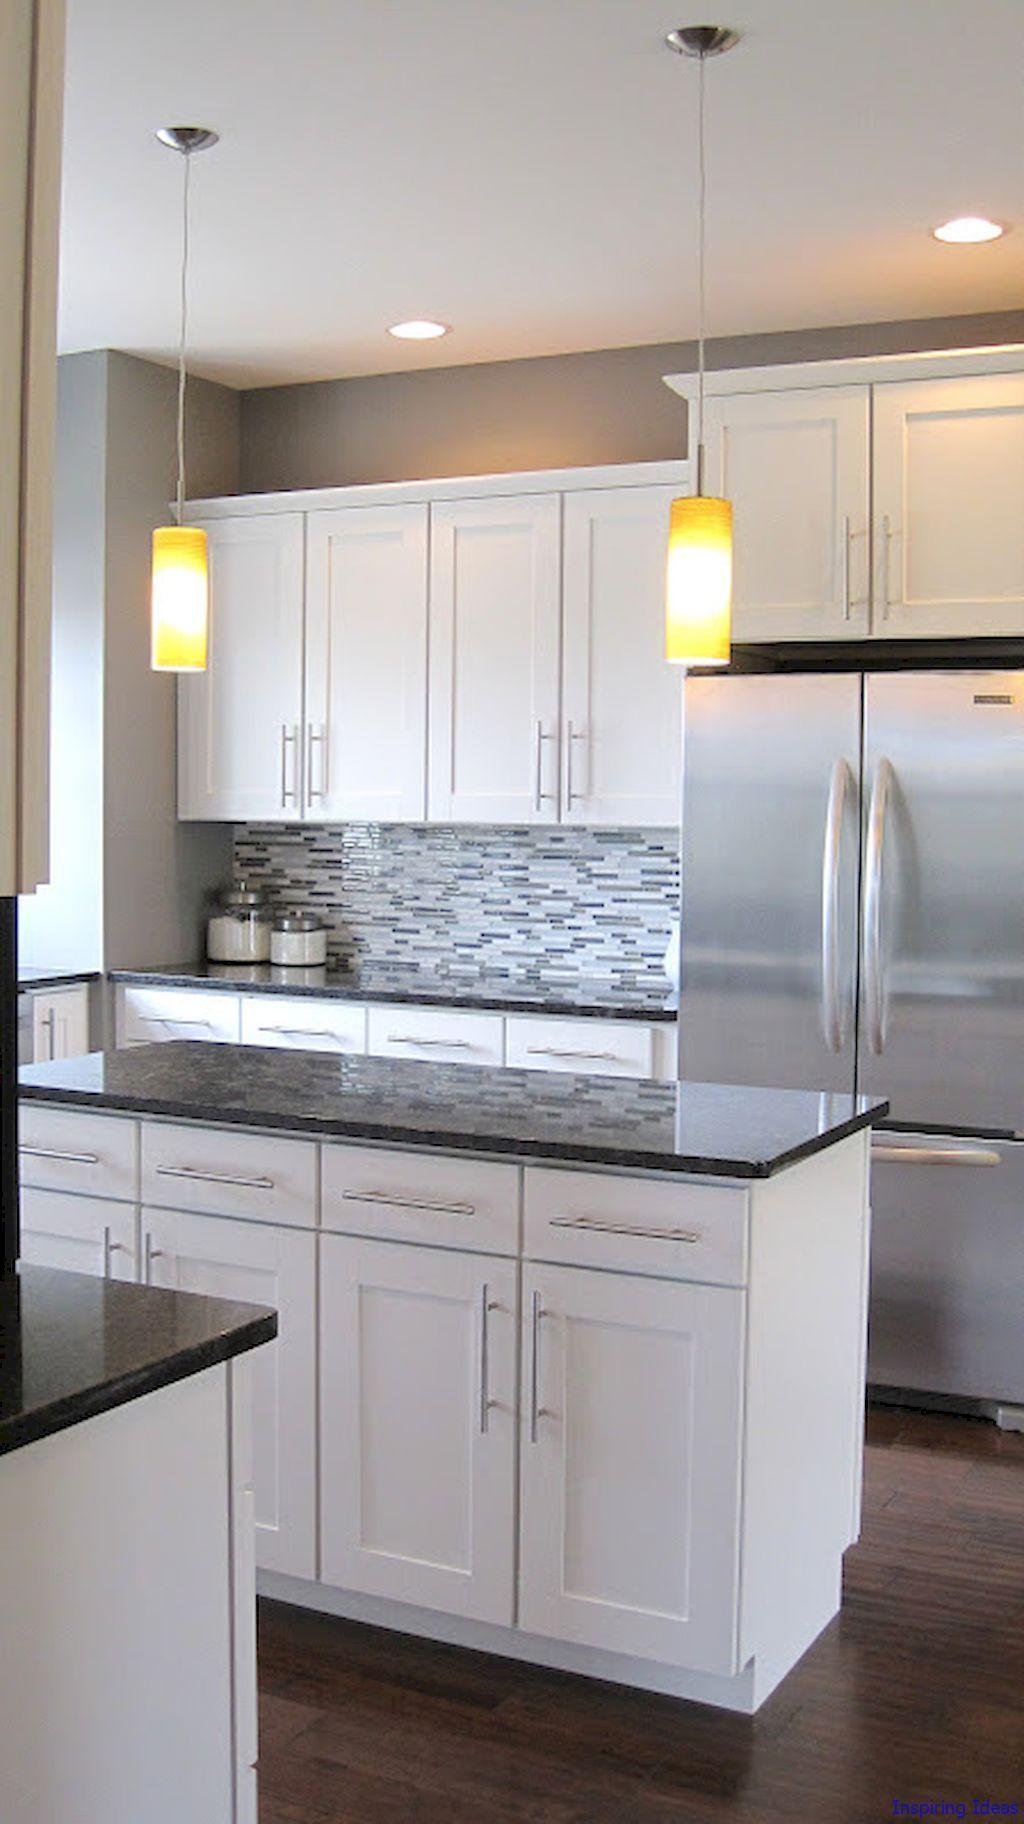 60 Luxury Black and White Kitchen Design Ideas